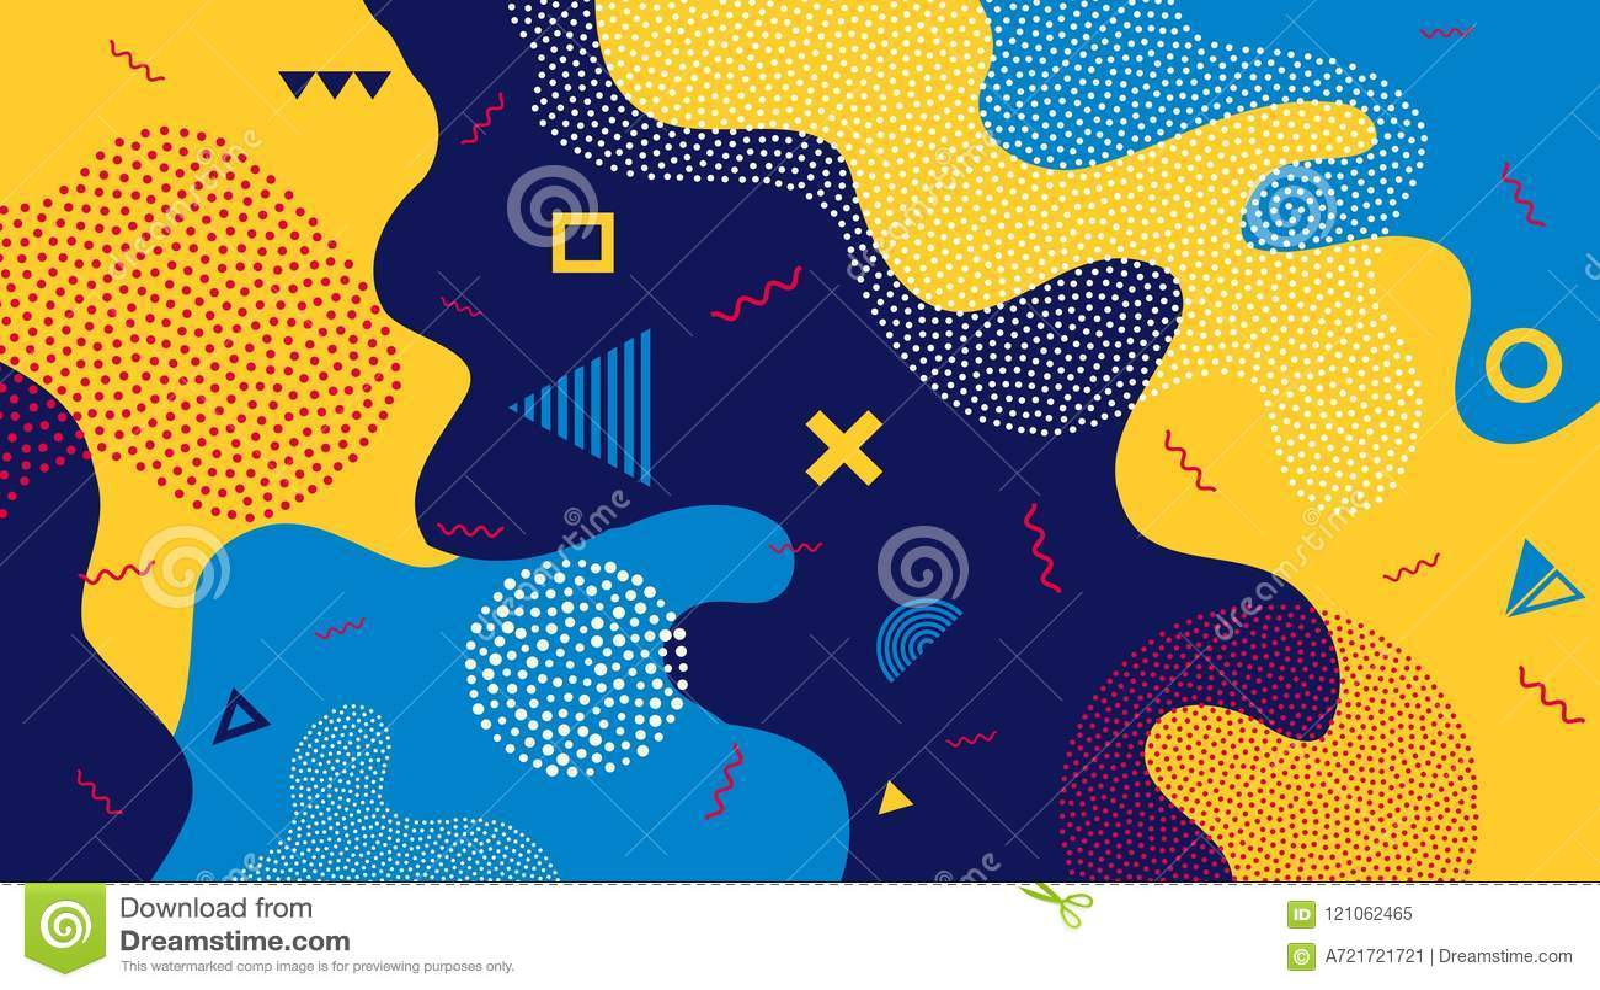 Creative vector illustration of children cartoon color splash background. Art design trendy 80s-90s memphis style